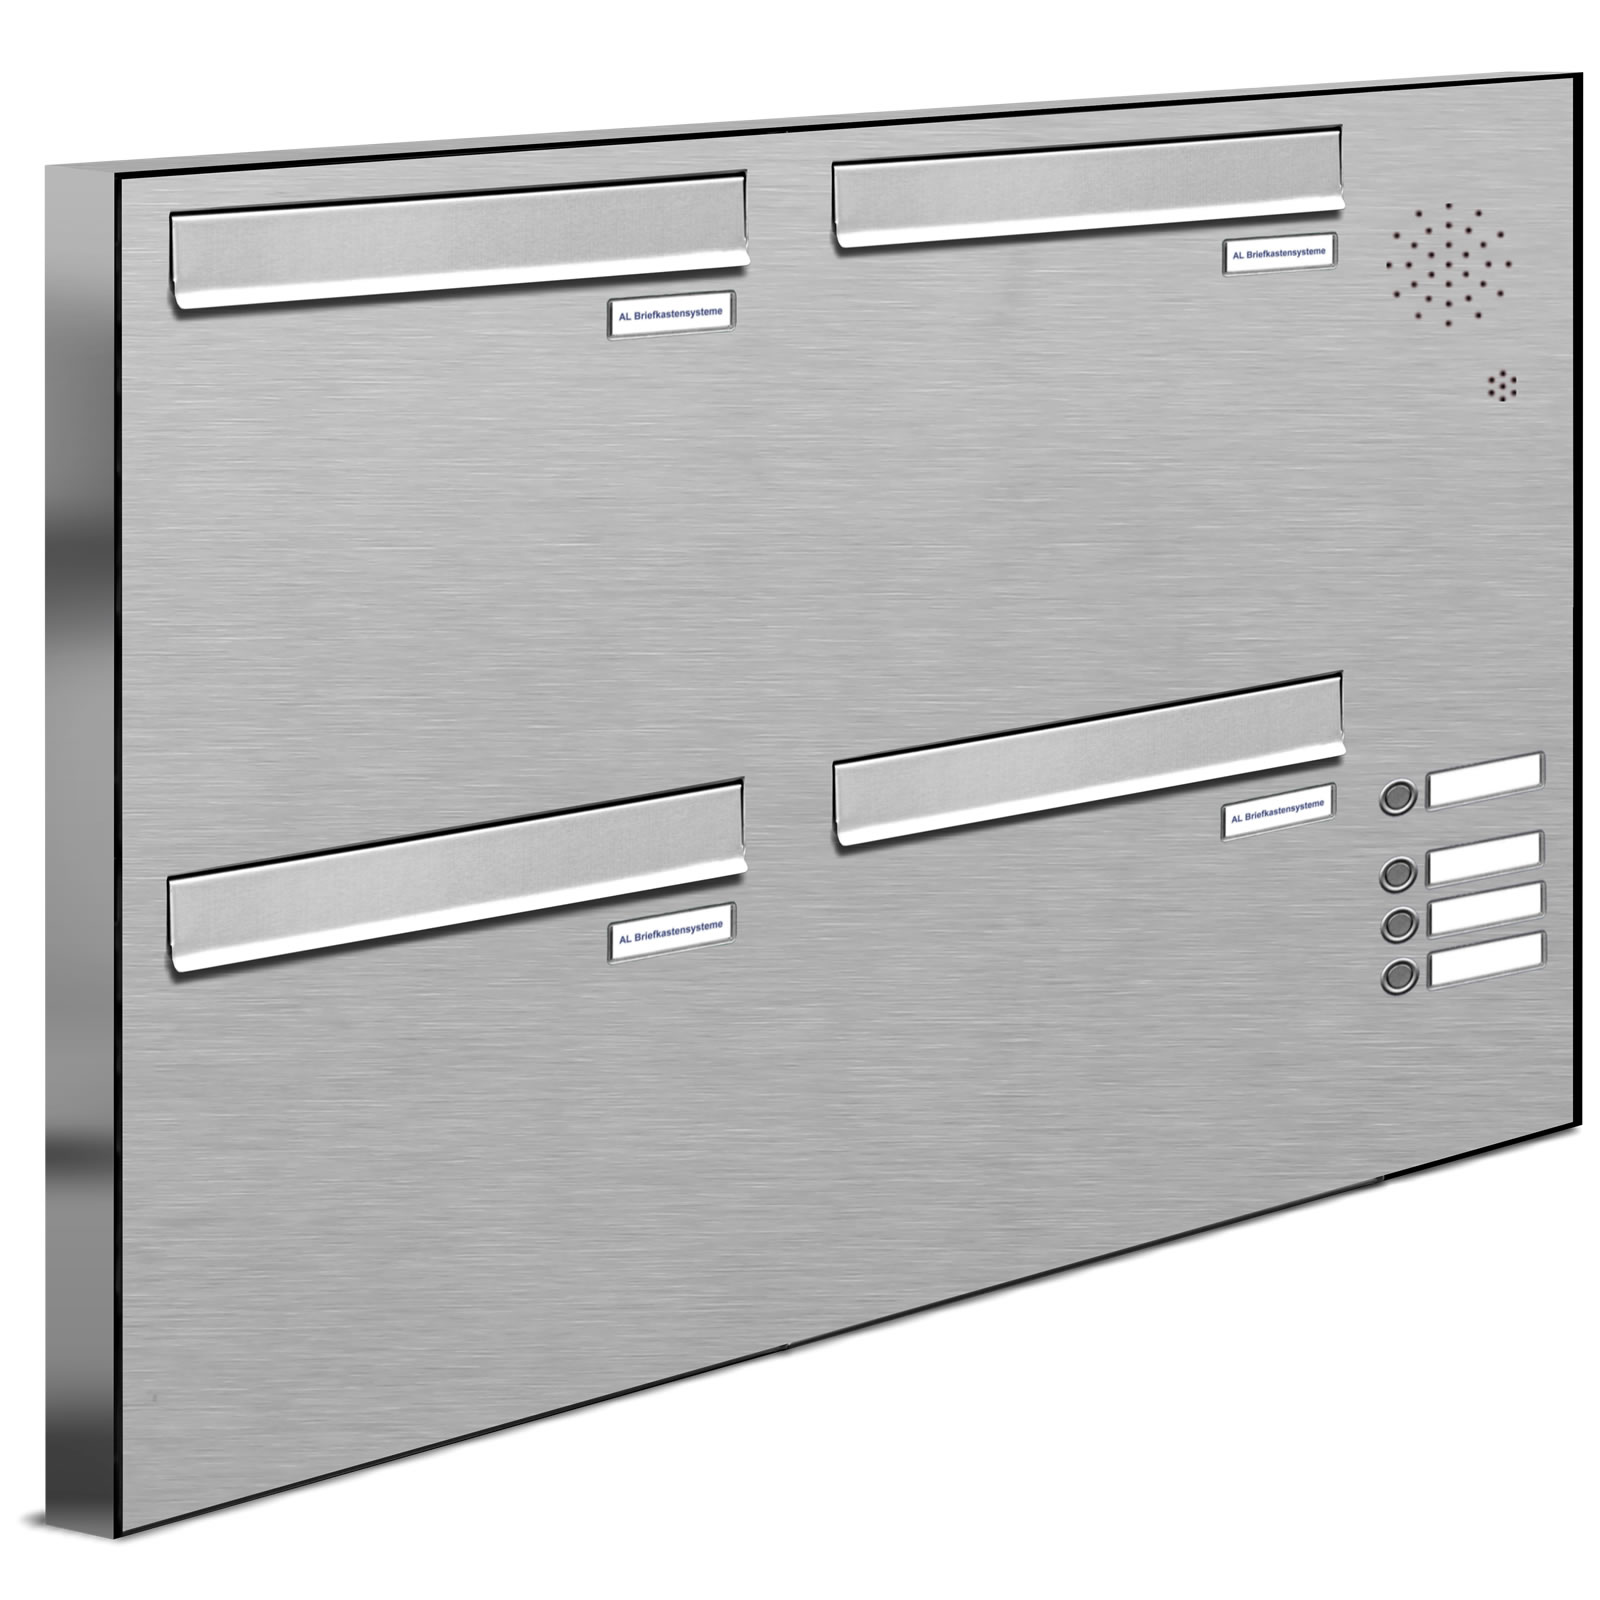 4er v2a edelstahl briefkastenanlage f r t r zaundurchwurf. Black Bedroom Furniture Sets. Home Design Ideas